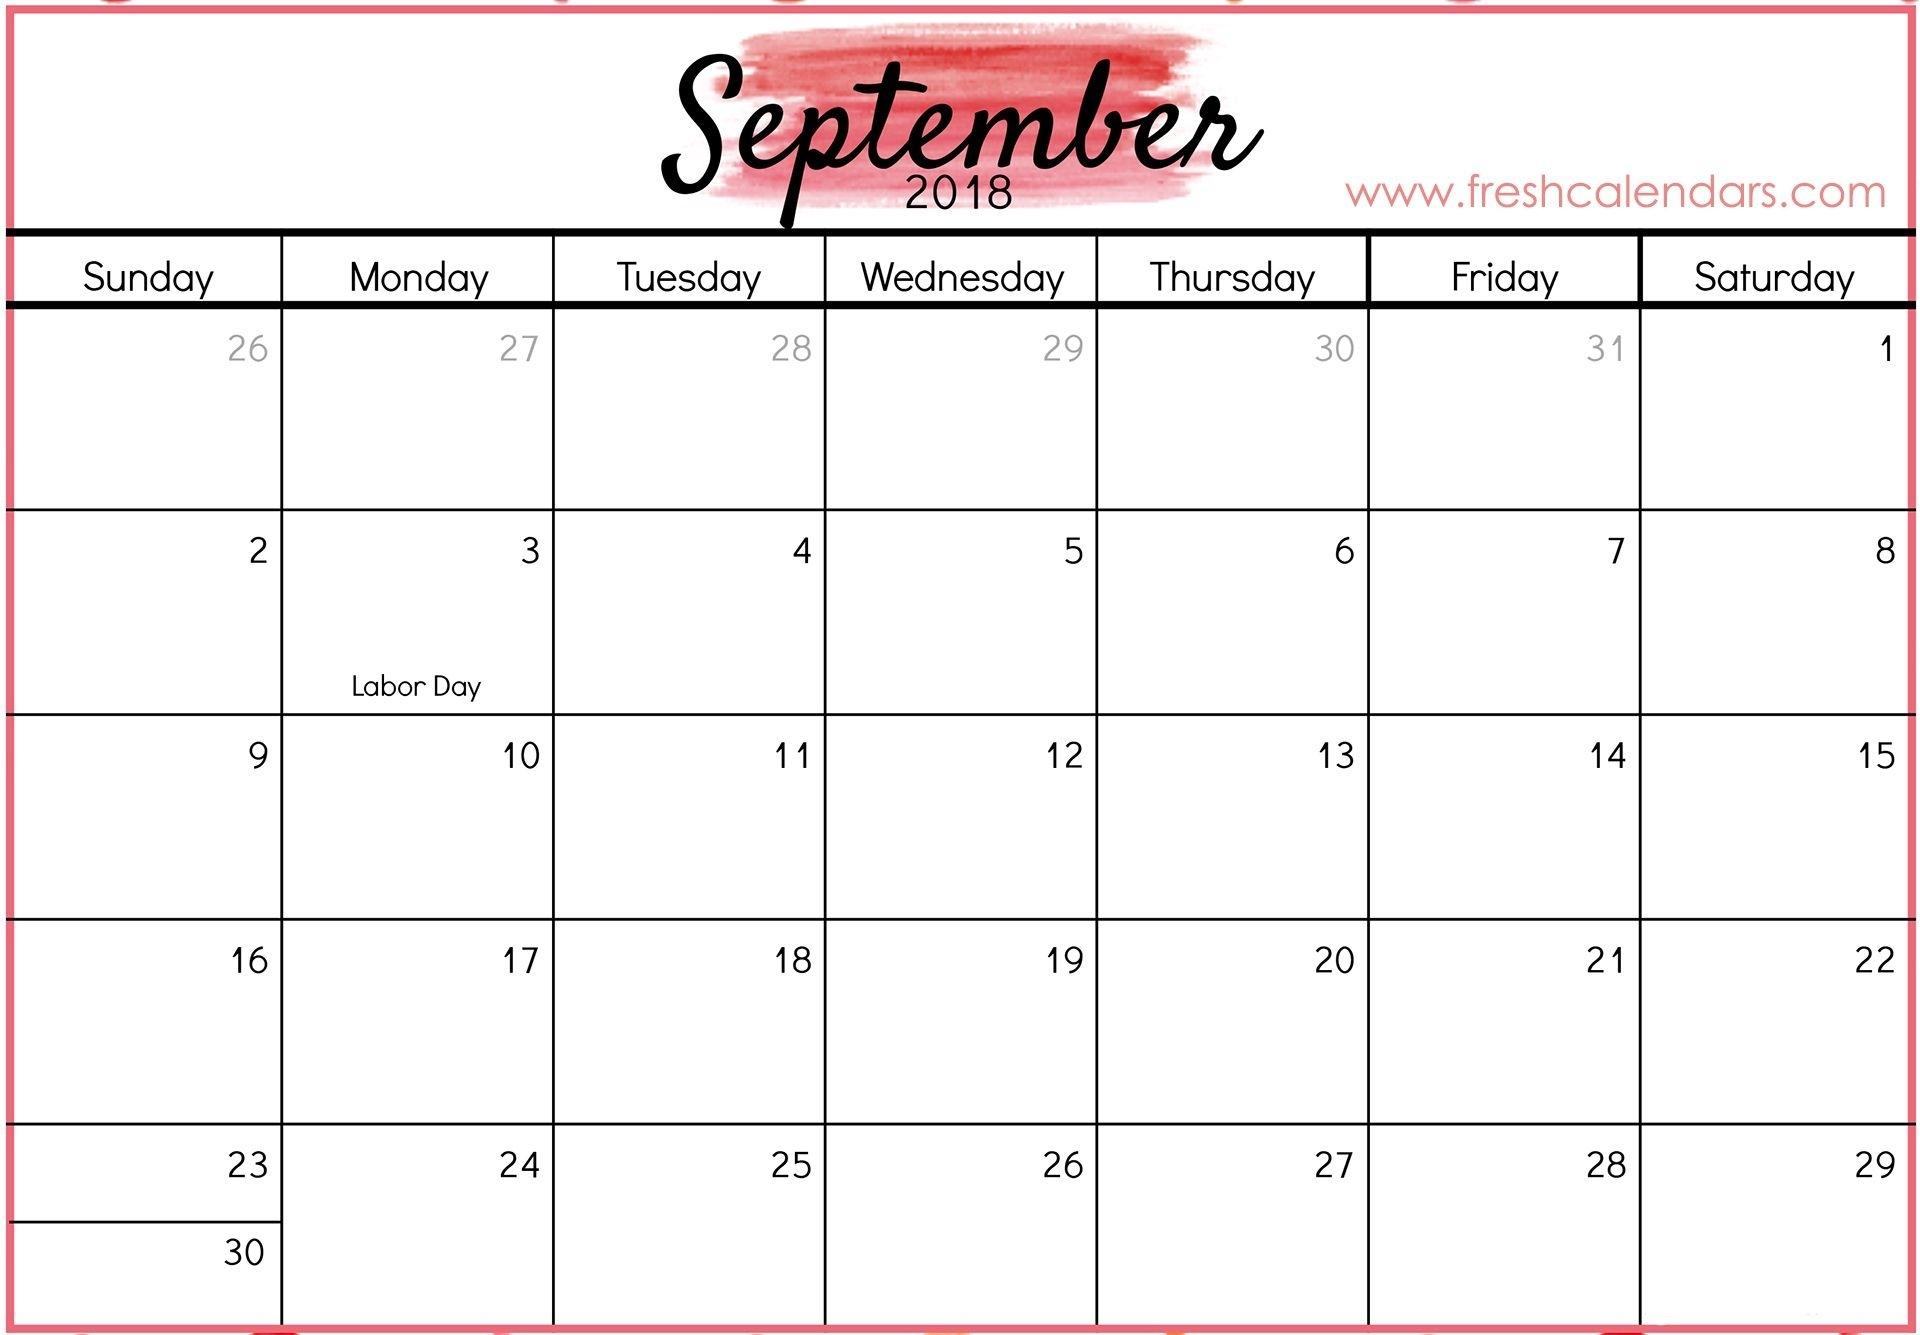 September 2018 Calendar Printable - Fresh Calendars with Print Out Of September Calendar